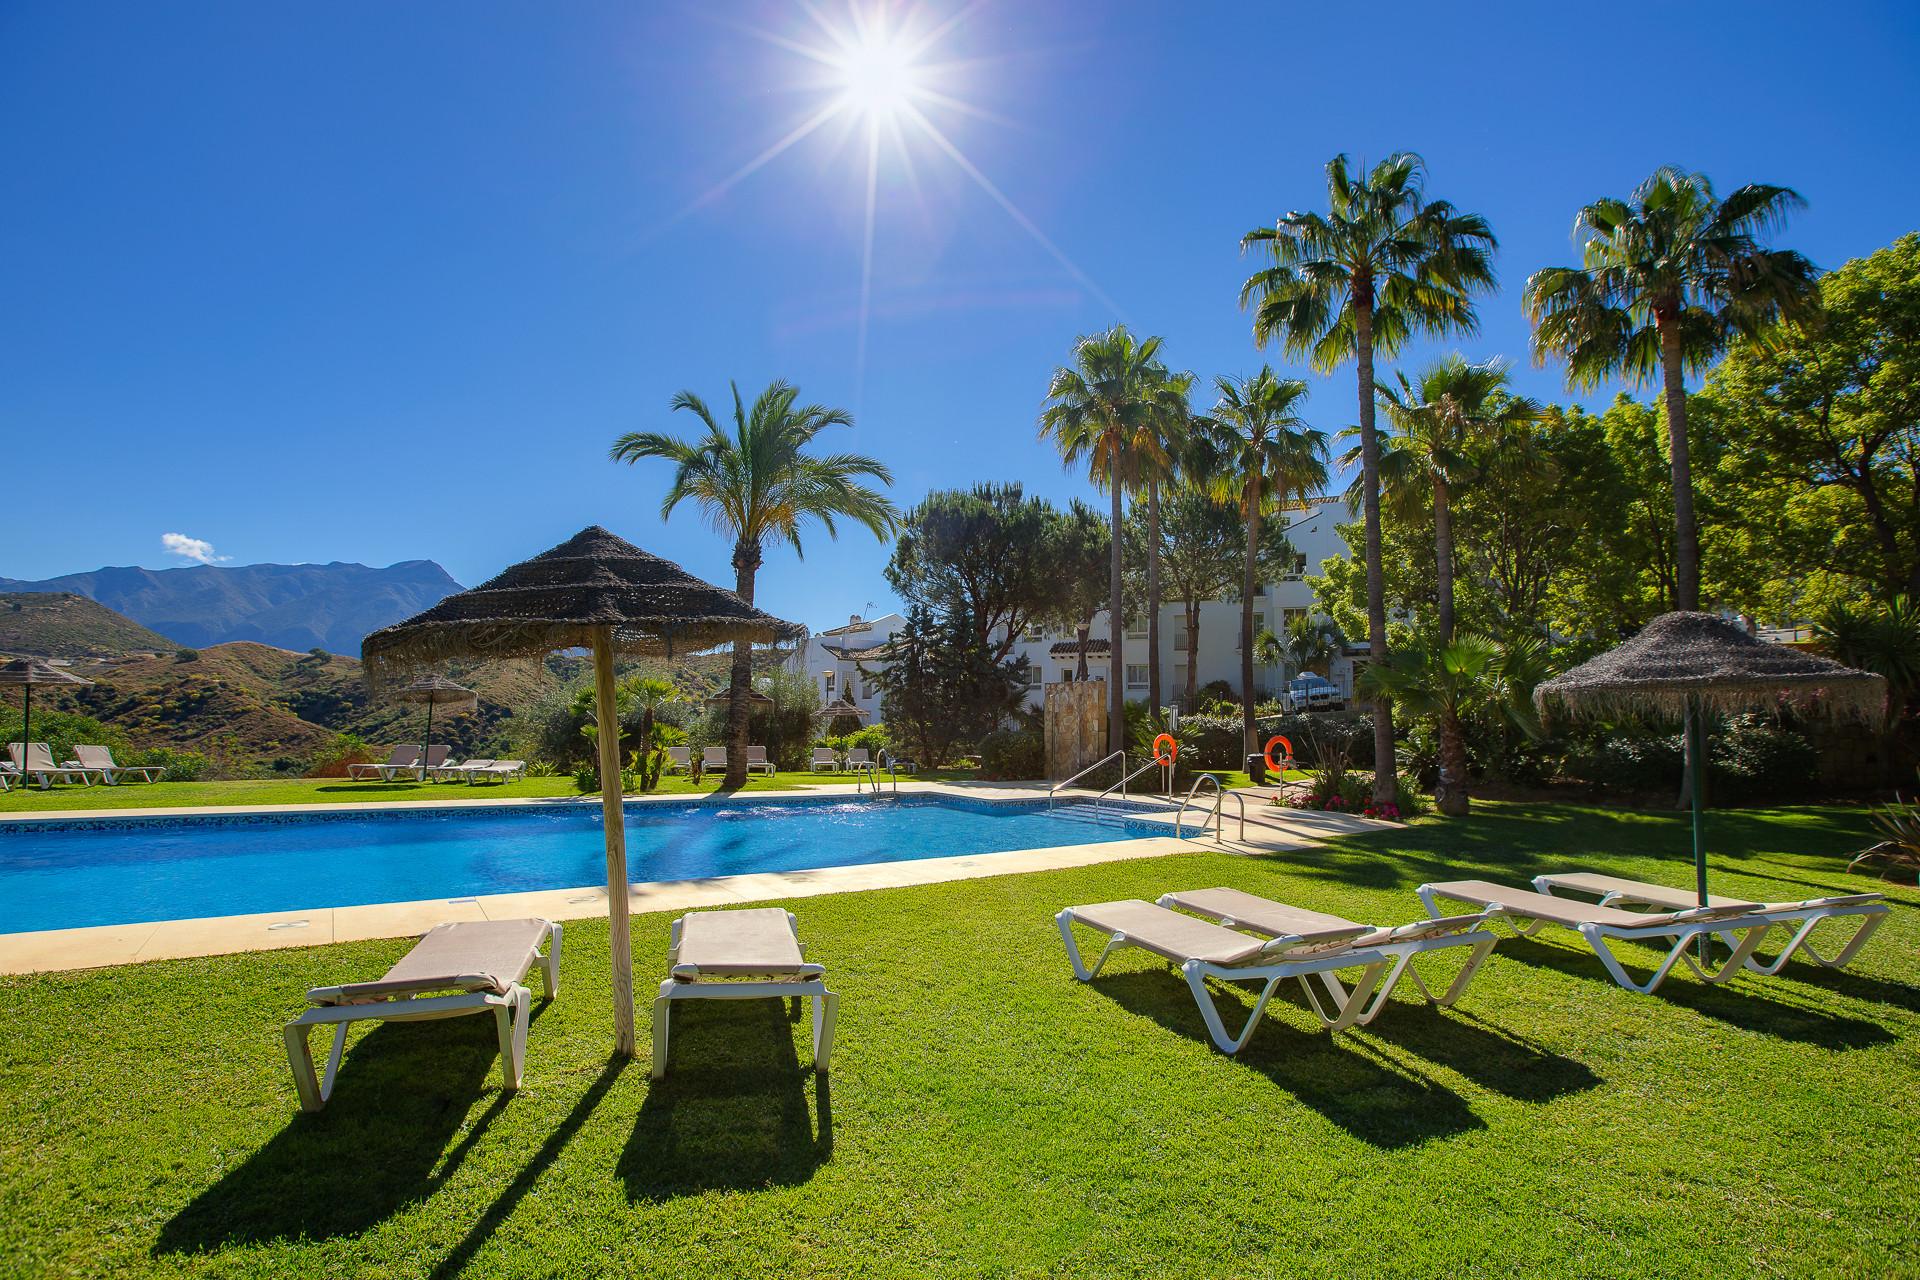 Apartment For Sale in Benahavis (Altos de La Quinta)